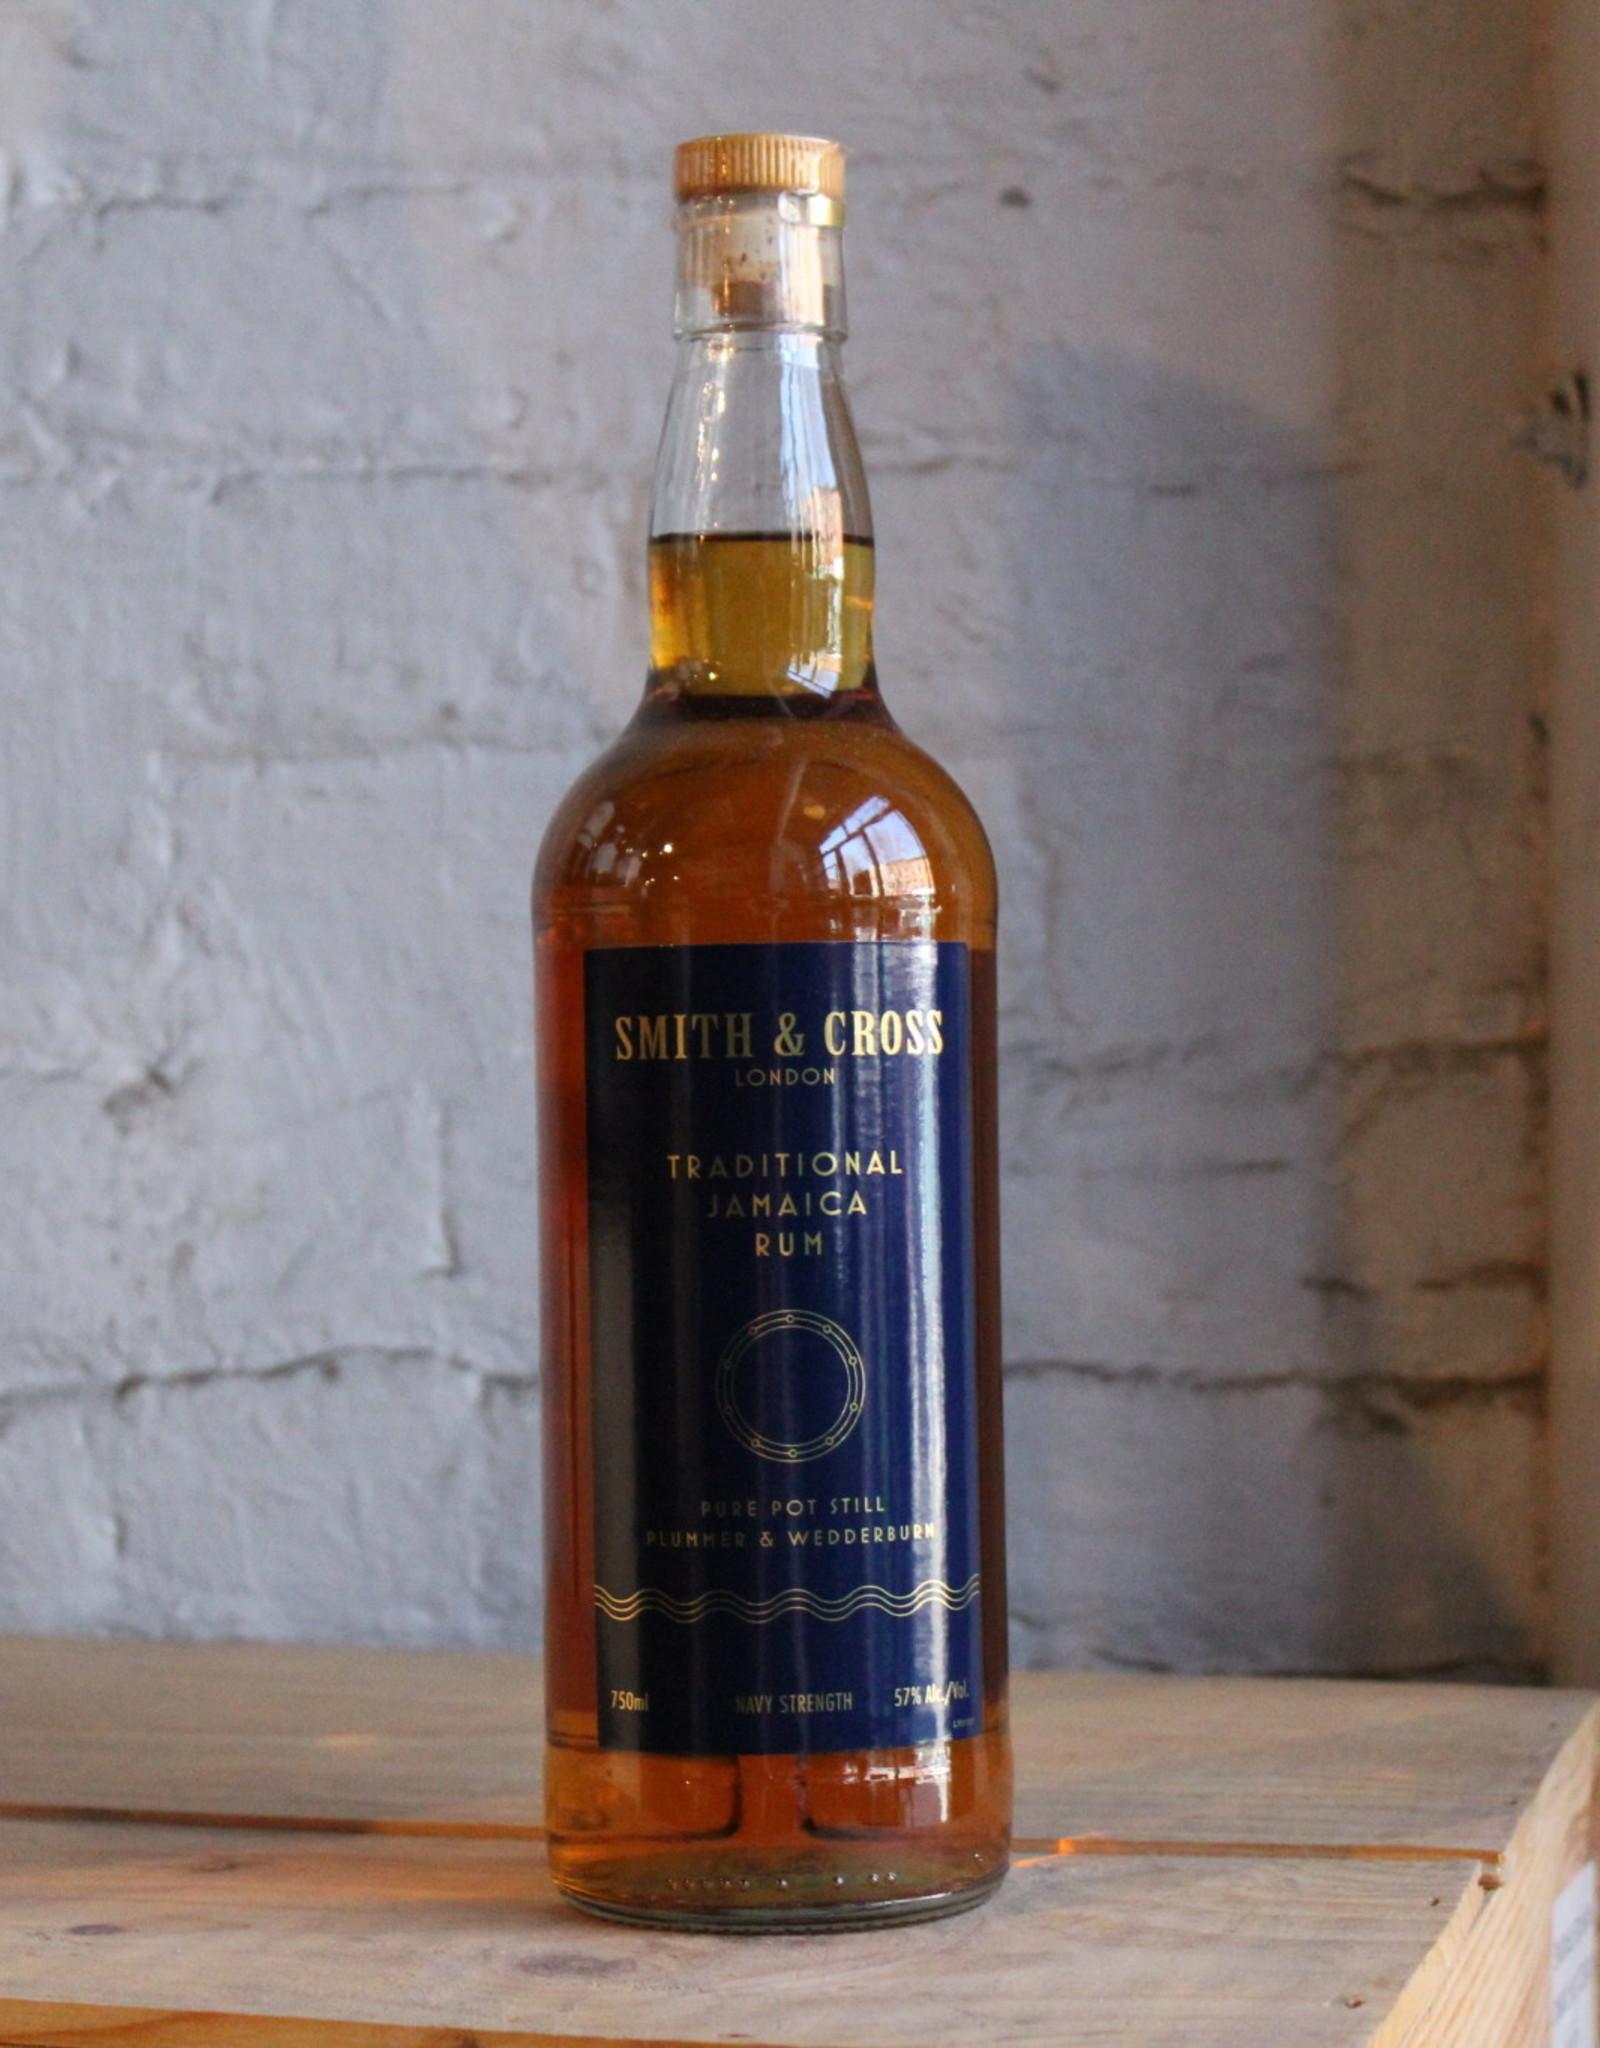 Smith and Cross Pure Pot Still Navy Strength Rum - Jamaica (750ml)